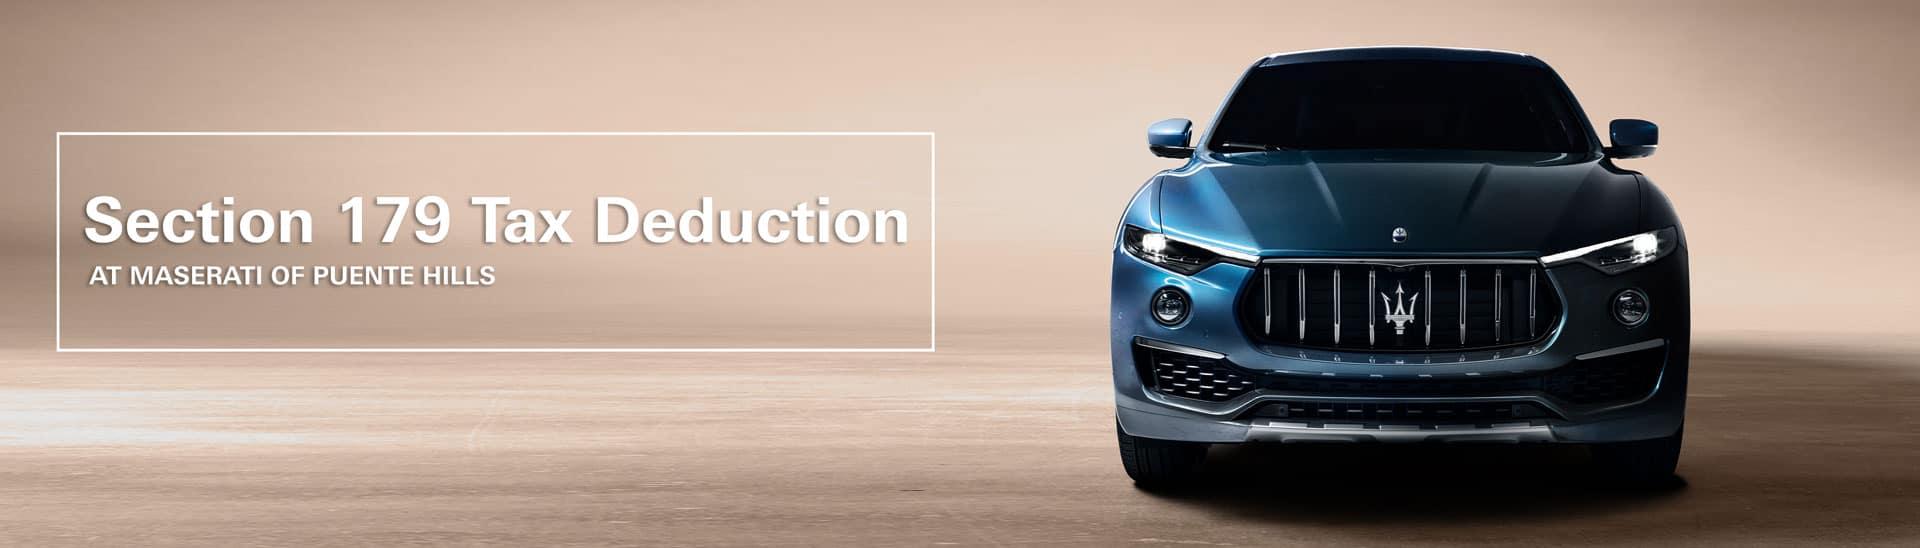 Section 179 Tax Deduction for Maserati Levante – Maserati Of Puente Hills